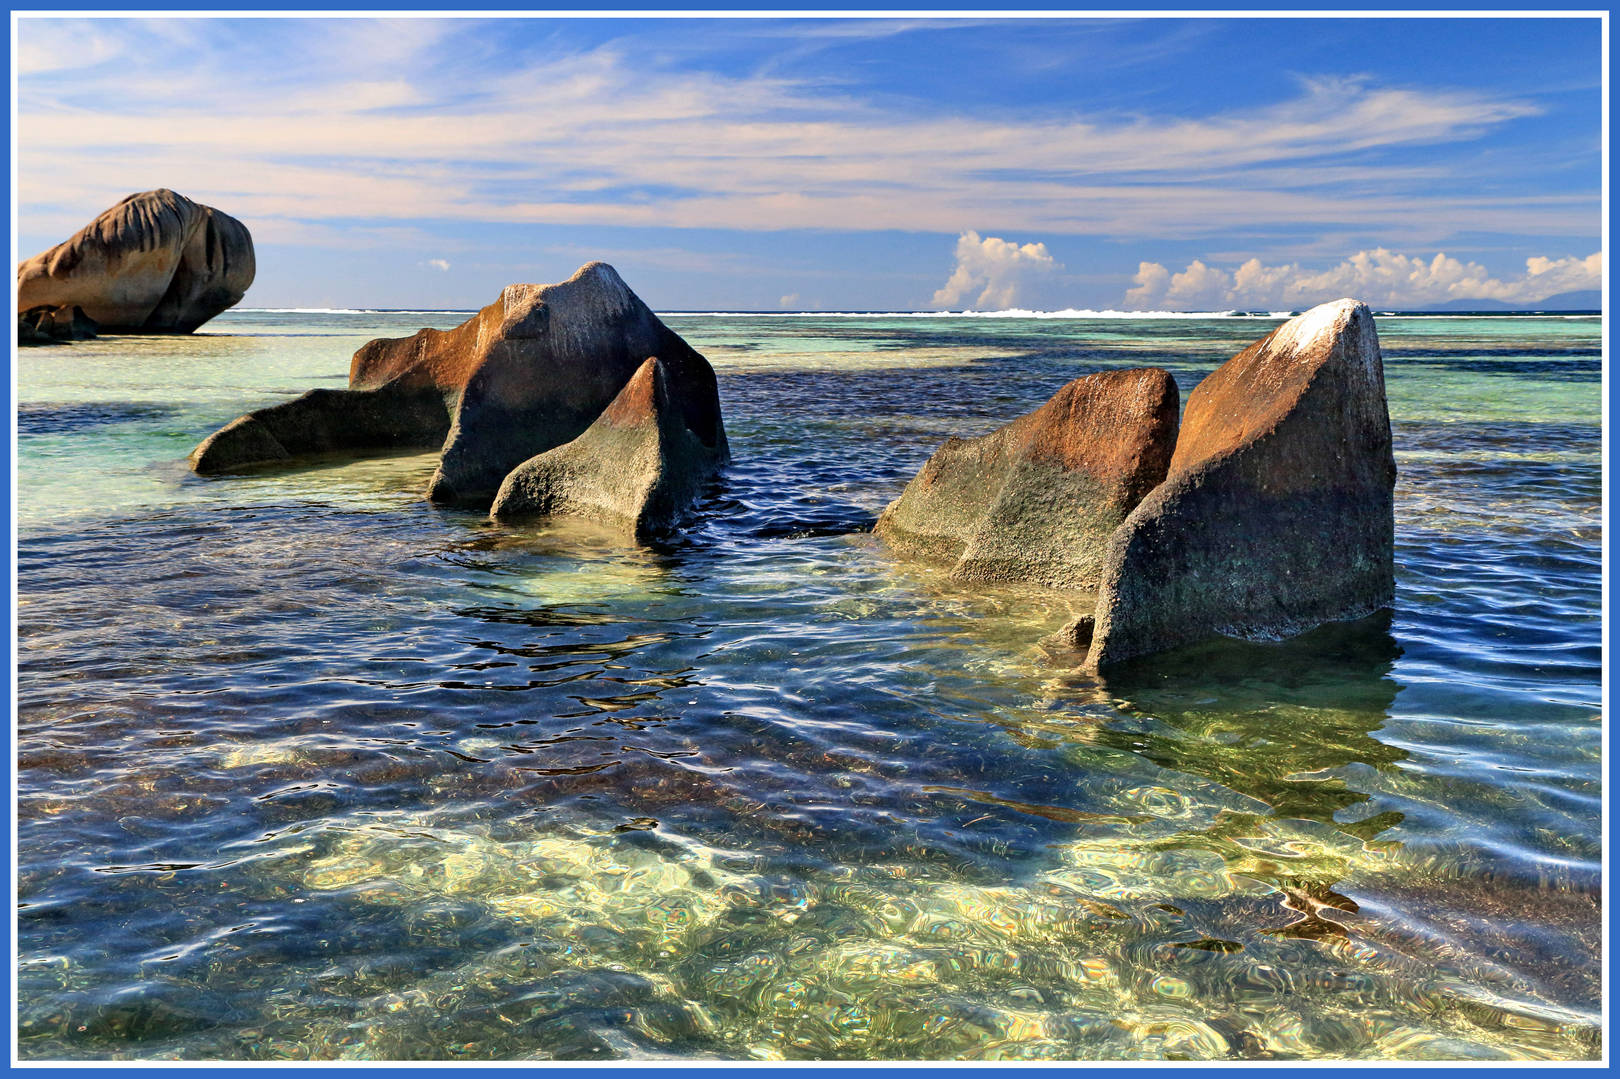 Сейшельские острова (The Seychelles)